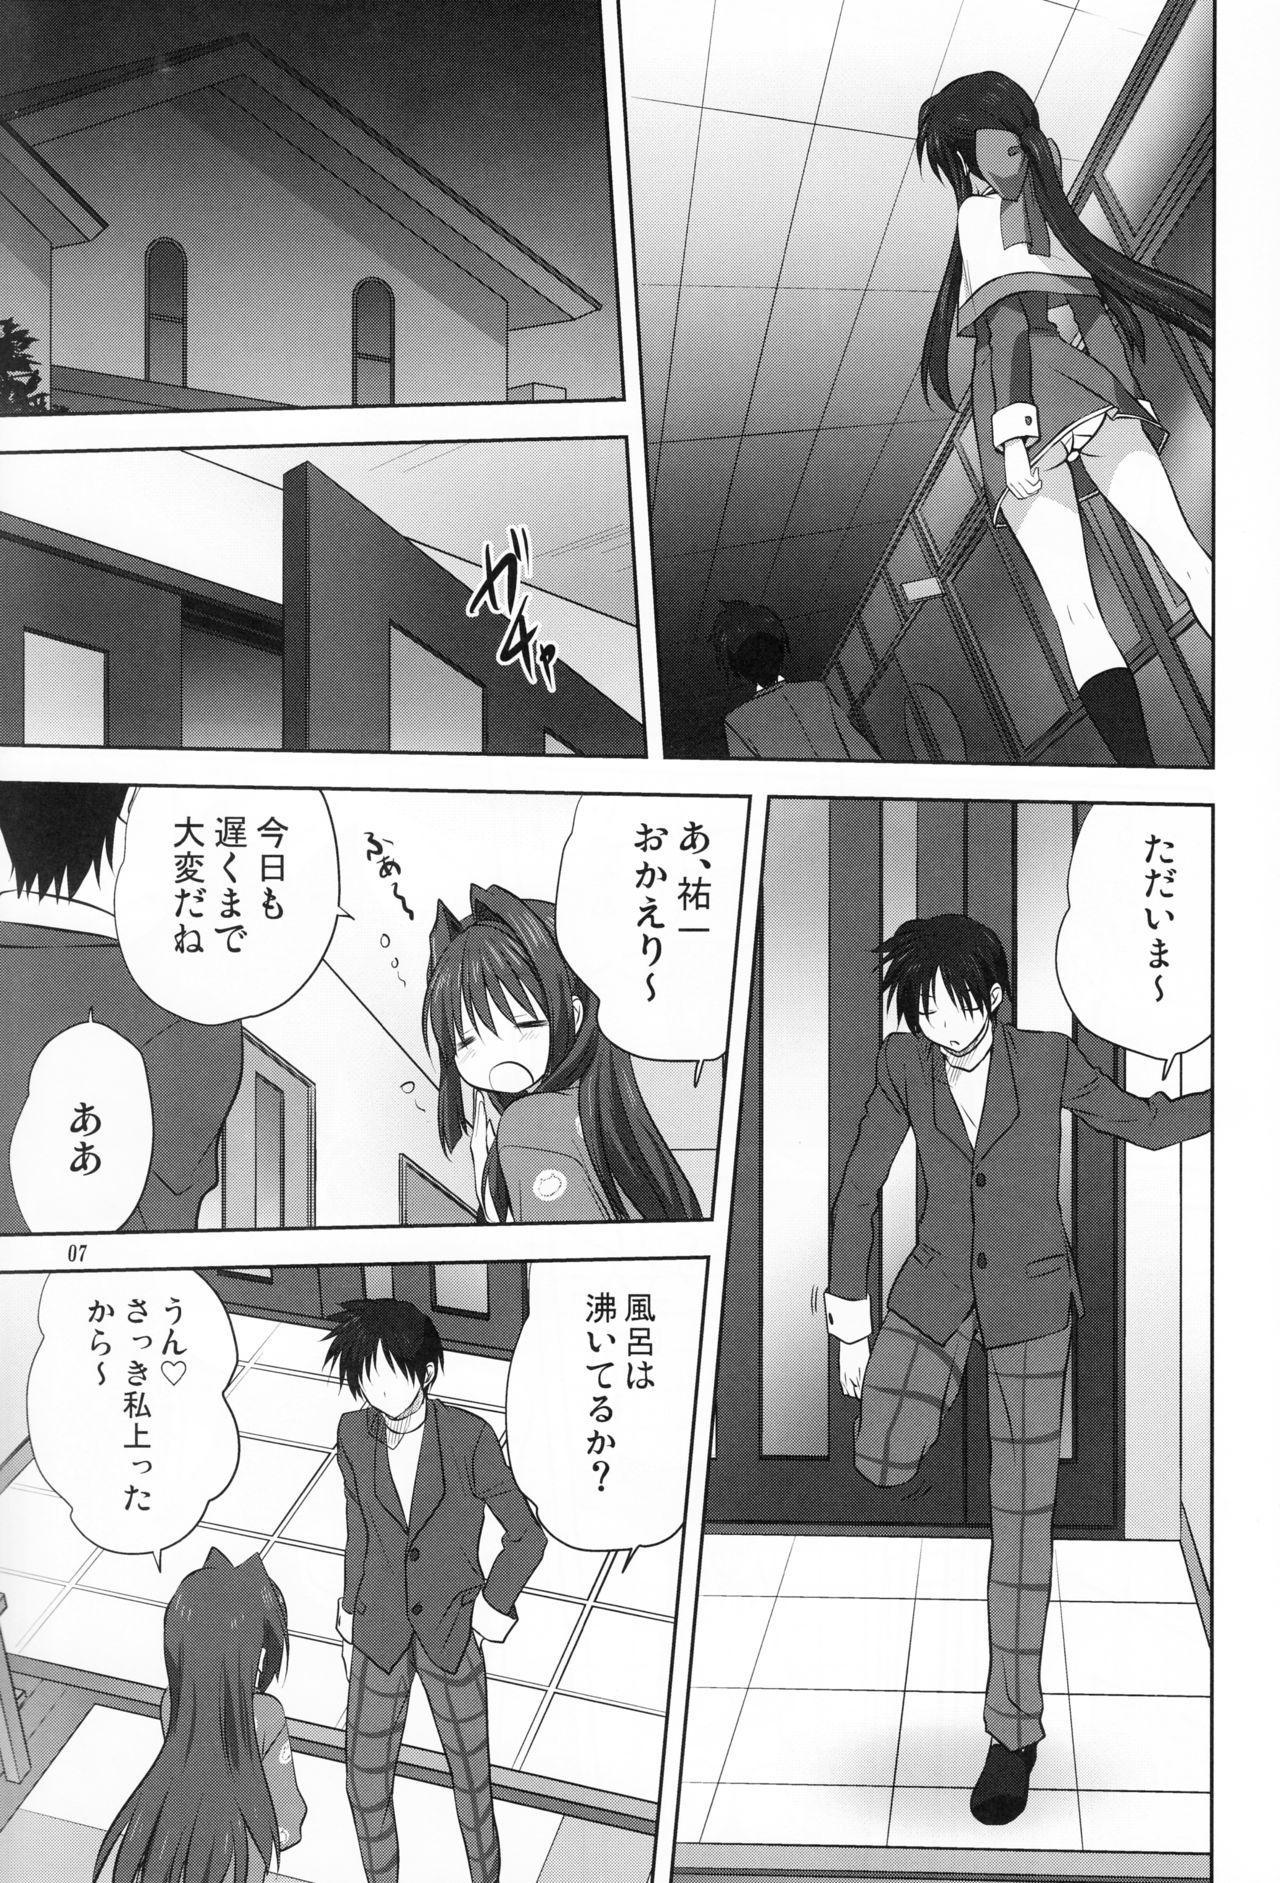 Akiko-san to Issho 18 5